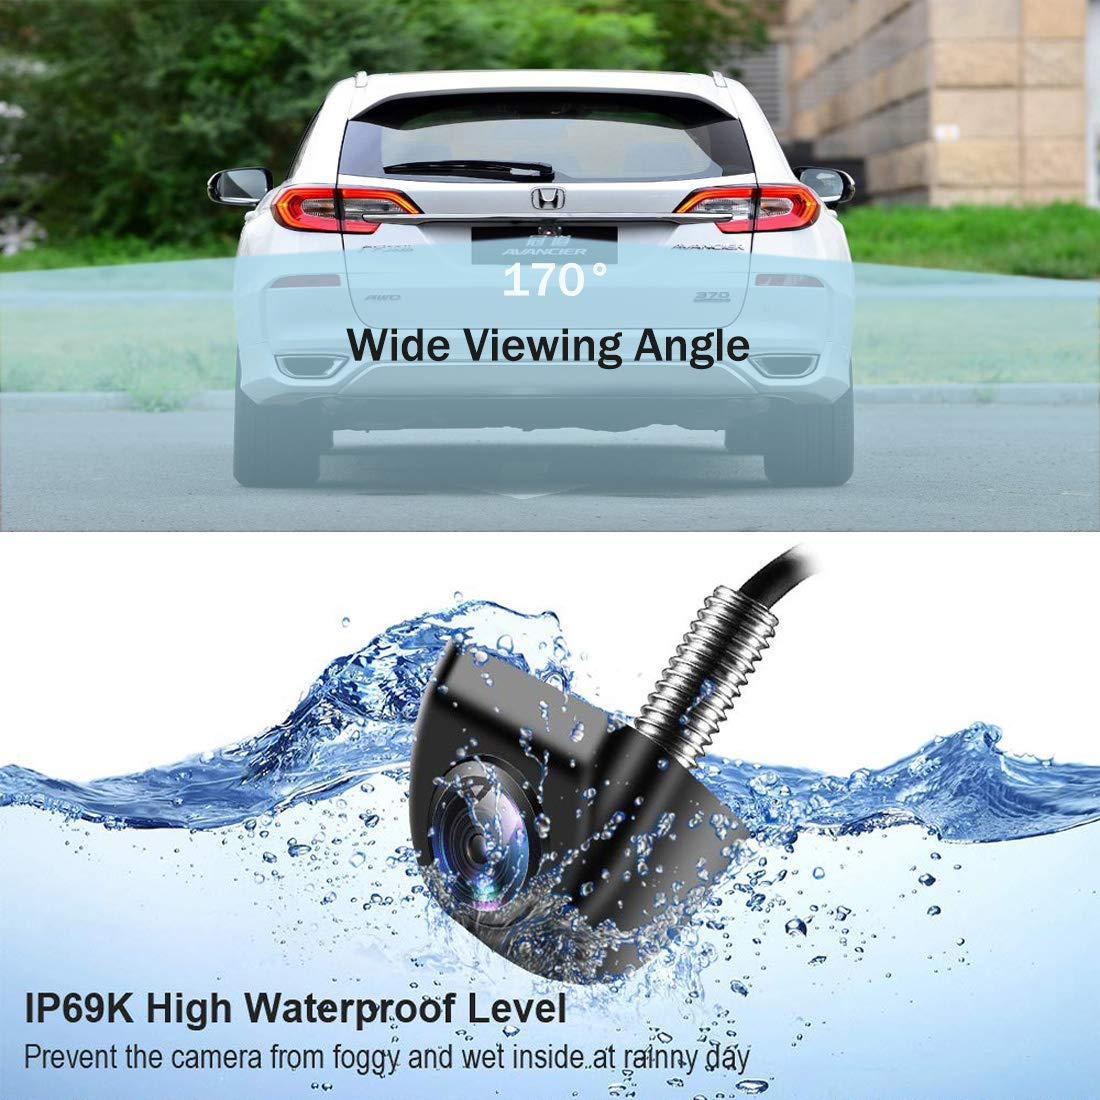 Car Backup Camera VoWinUS HD Super Wide Viewing Angle Night Vision Metal IP69K Waterproof Car Auto Rear View Camera Parking Camera for Car Truck RV Mini-Van